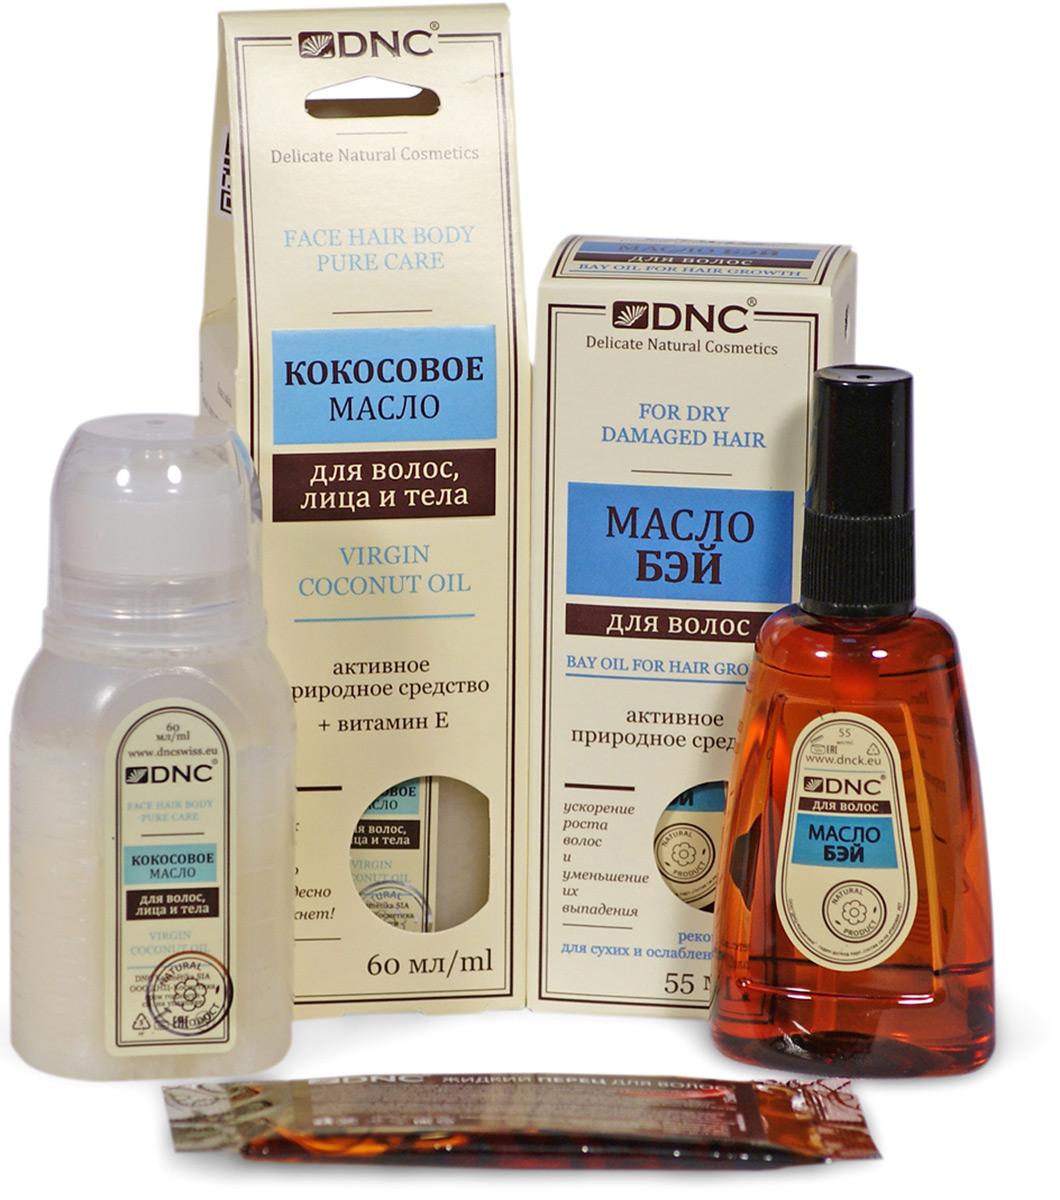 DNC Набор: Кокосовое масло, 60 мл, Масло Бэй, 55 мл + Подарок Жидкий перец для волос, 15 мл dnc набор филлер для волос 3 15 мл и шелк для волос 4 10 мл